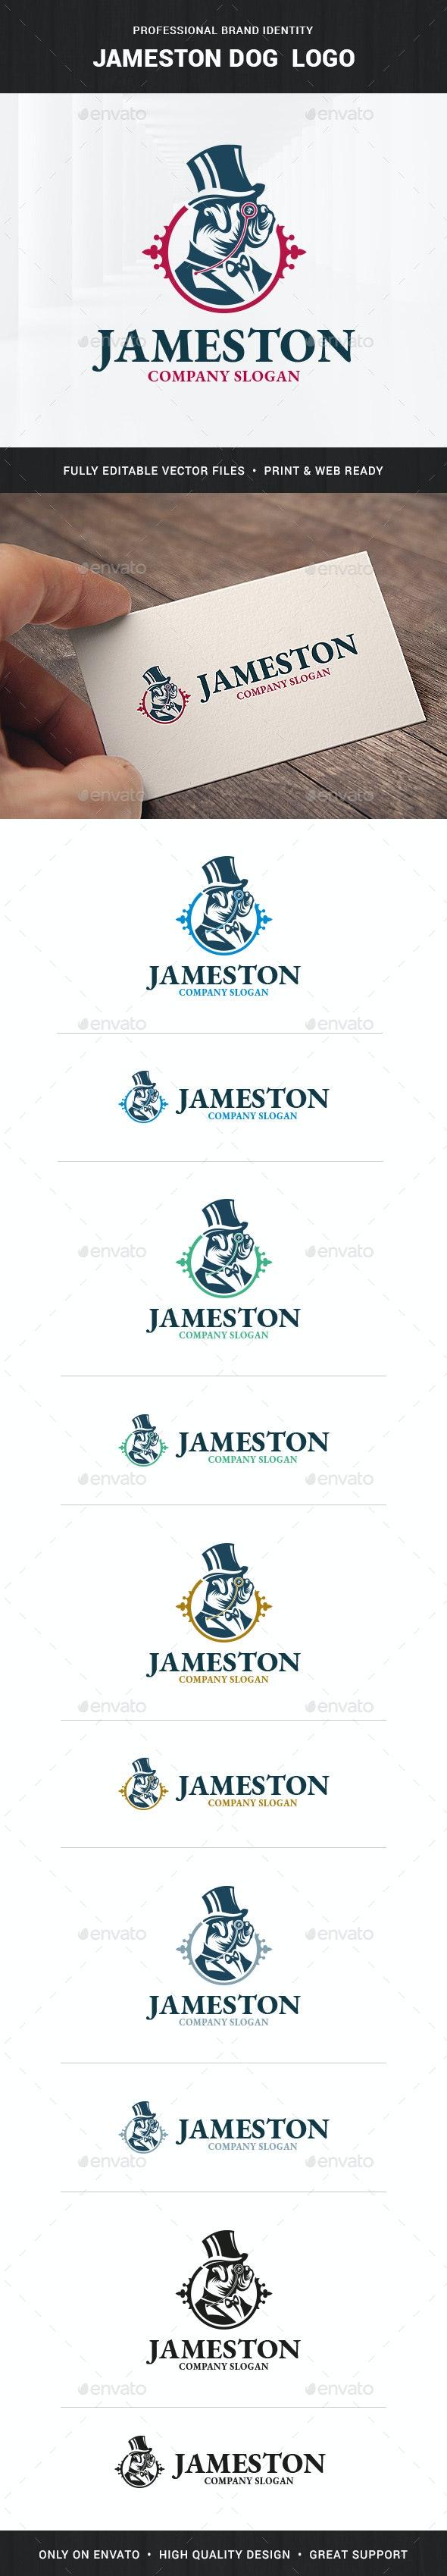 Jameston Dog Logo Template - Animals Logo Templates